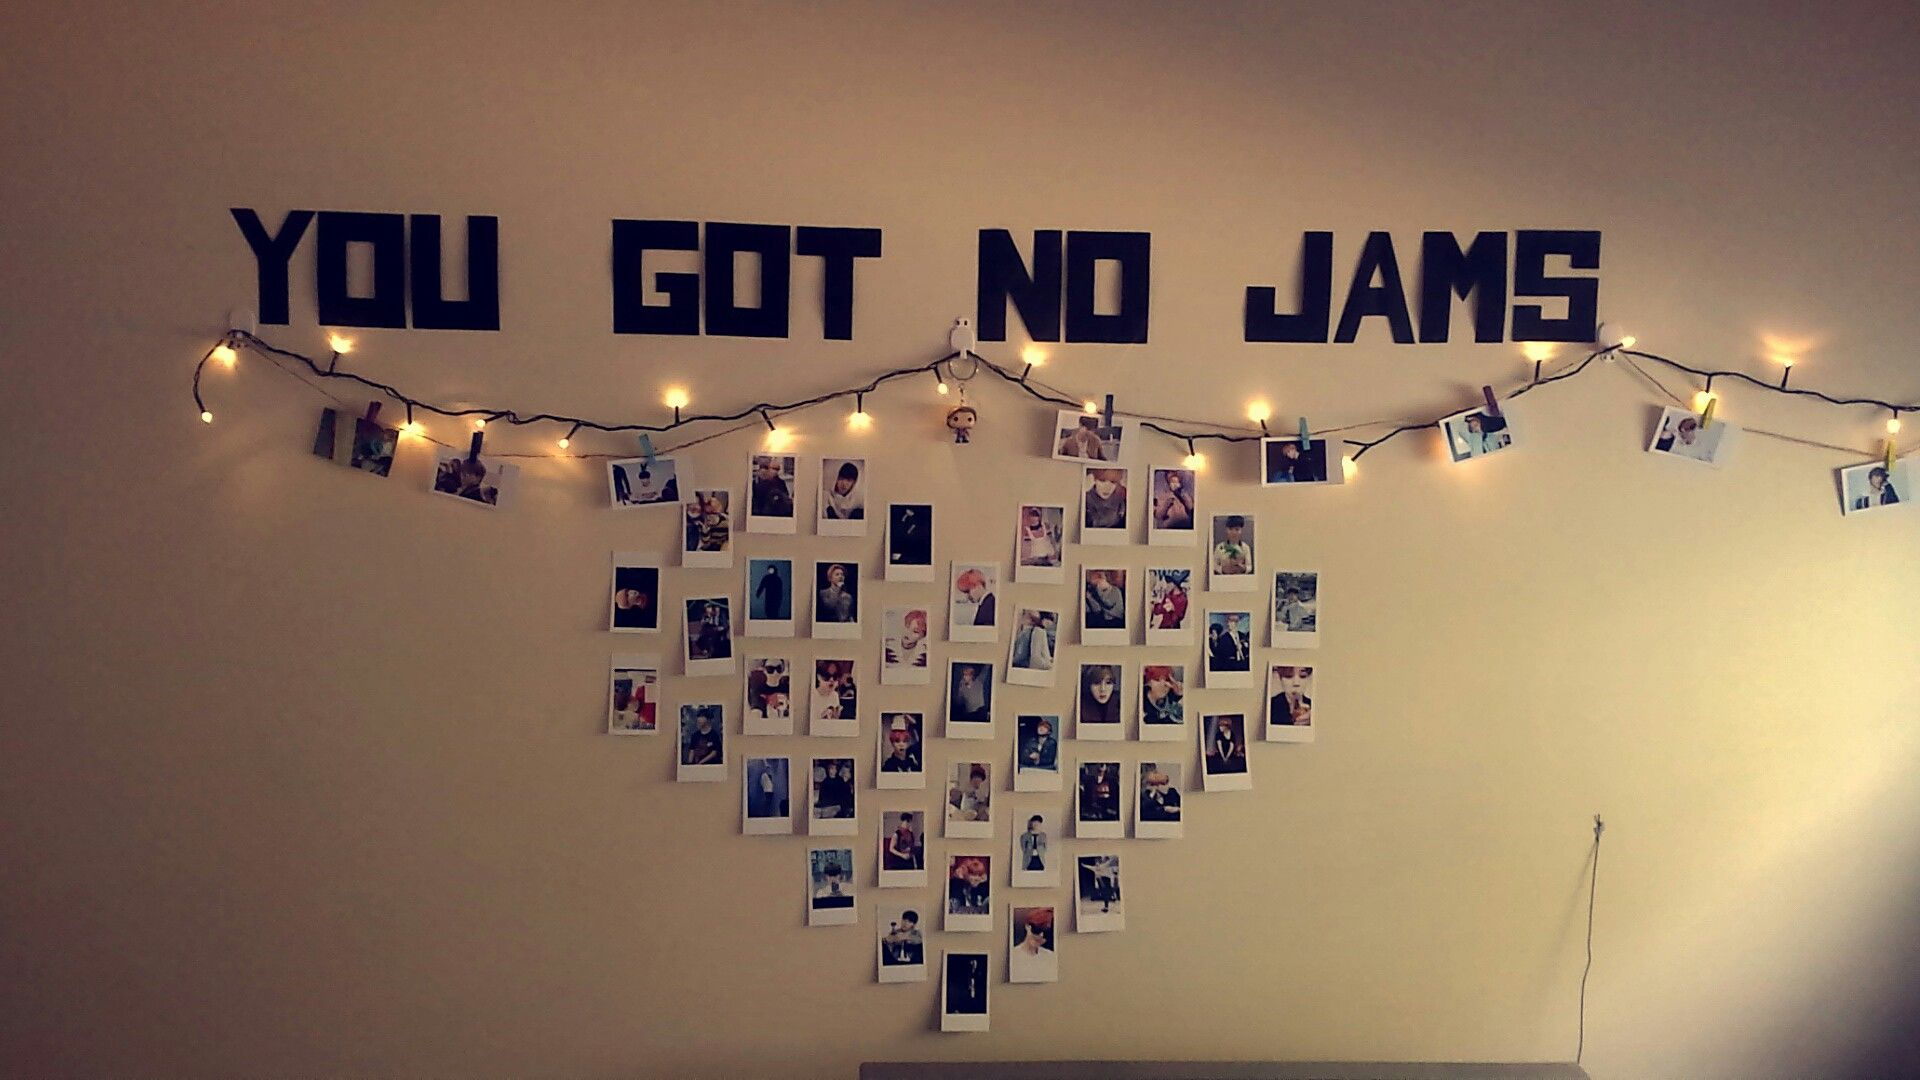 Kpop Room Decor Diy Bts Jimin Polaroids Stopjimin2k16